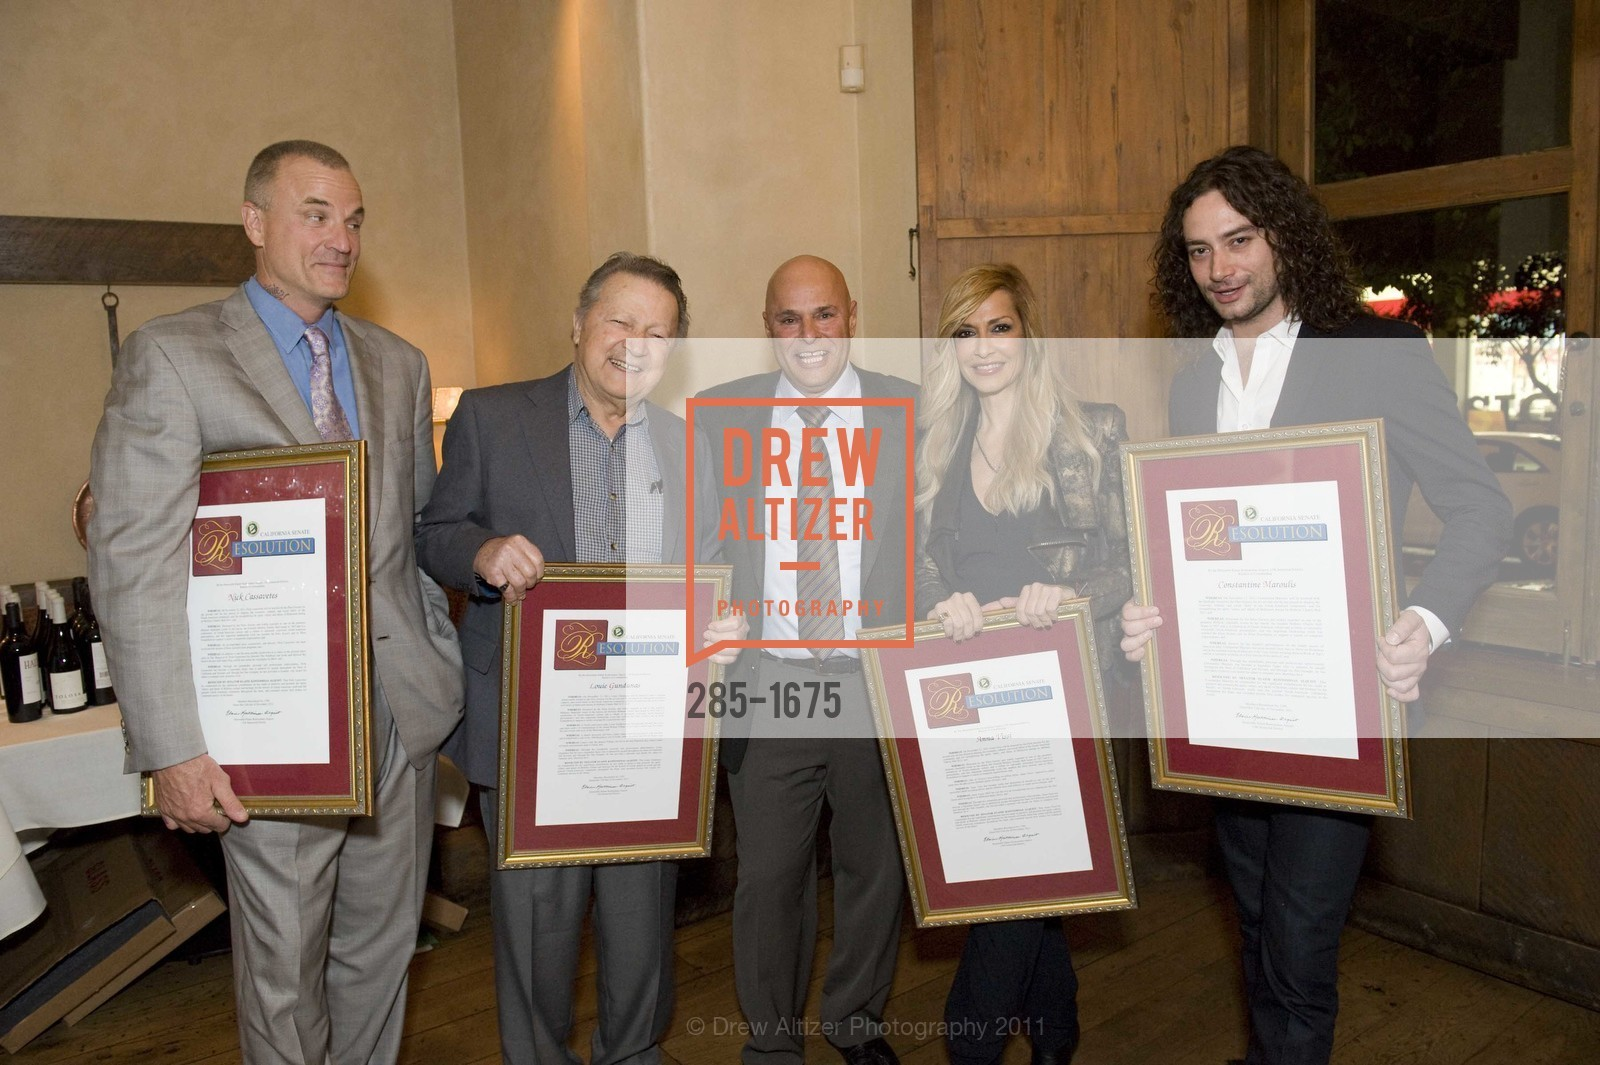 Nick Cassavetes, Louie Gundanas, Tony Saris, Anna Vissi, Constantine Maroulis, Photo #285-1675